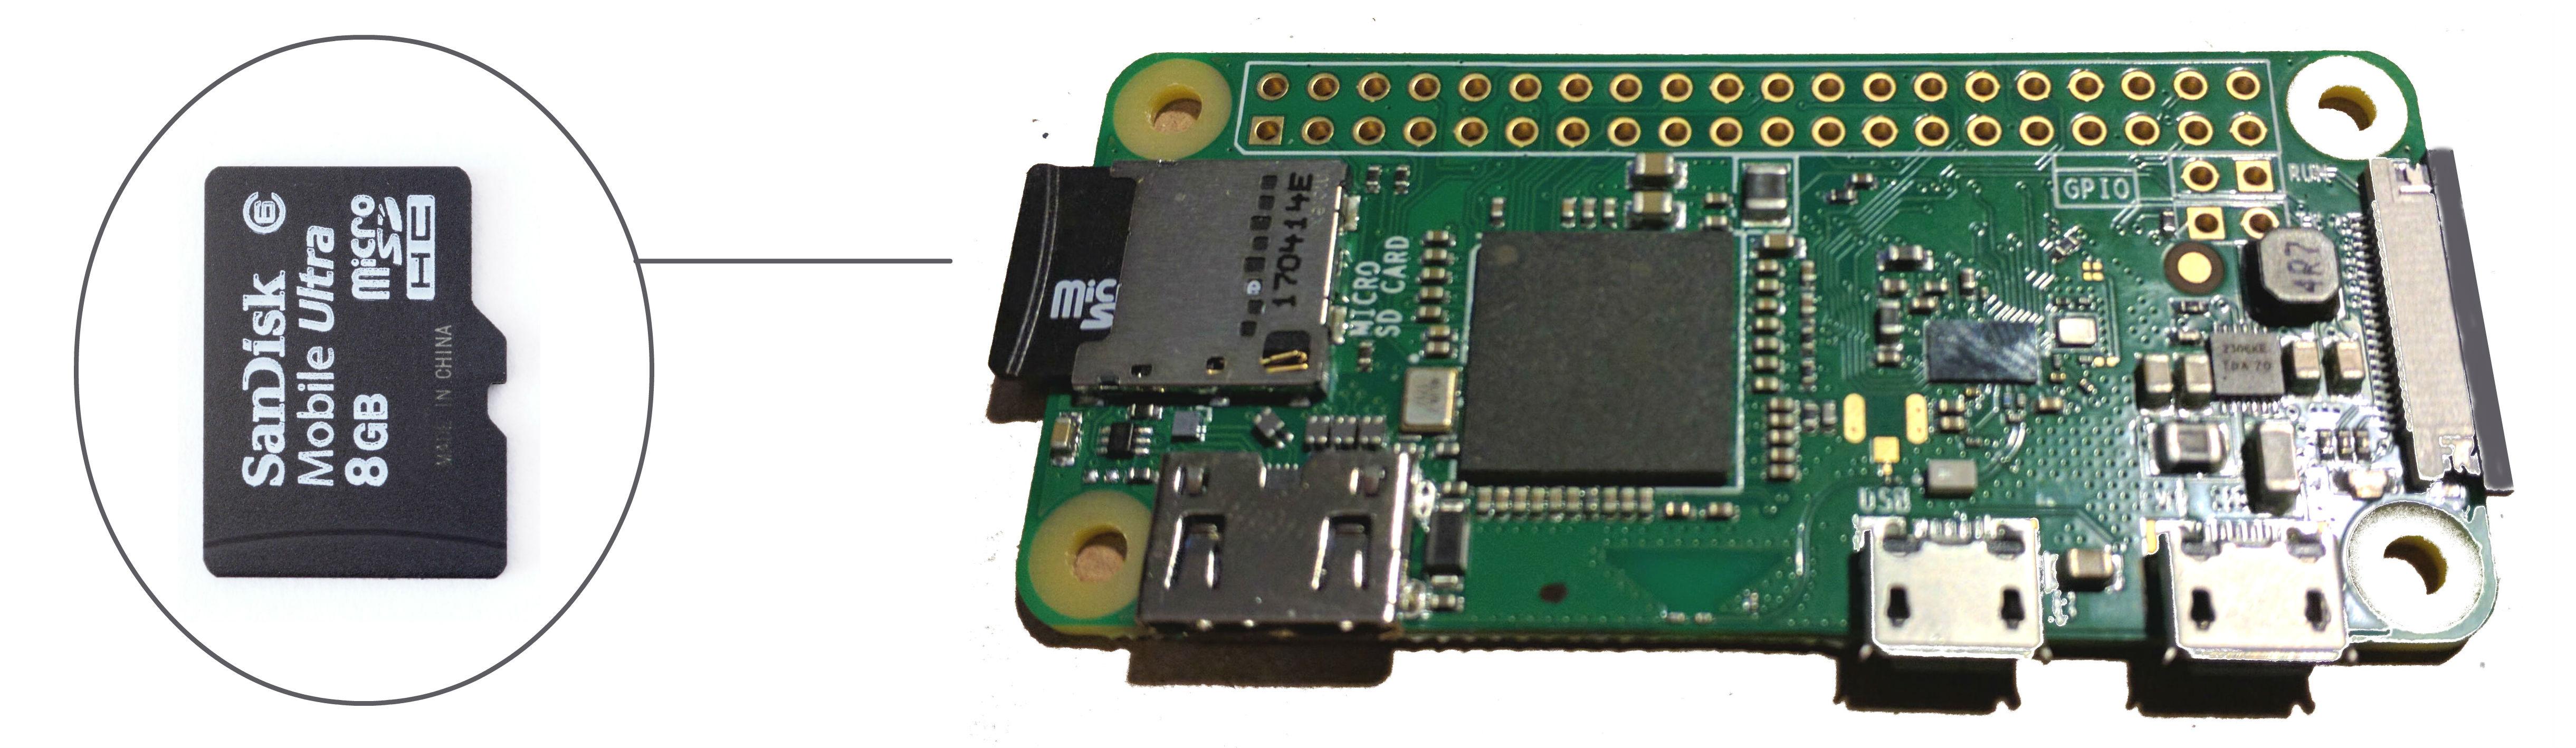 🎈 Public Lab: Prepare an SD card for a Raspberry Pi camera